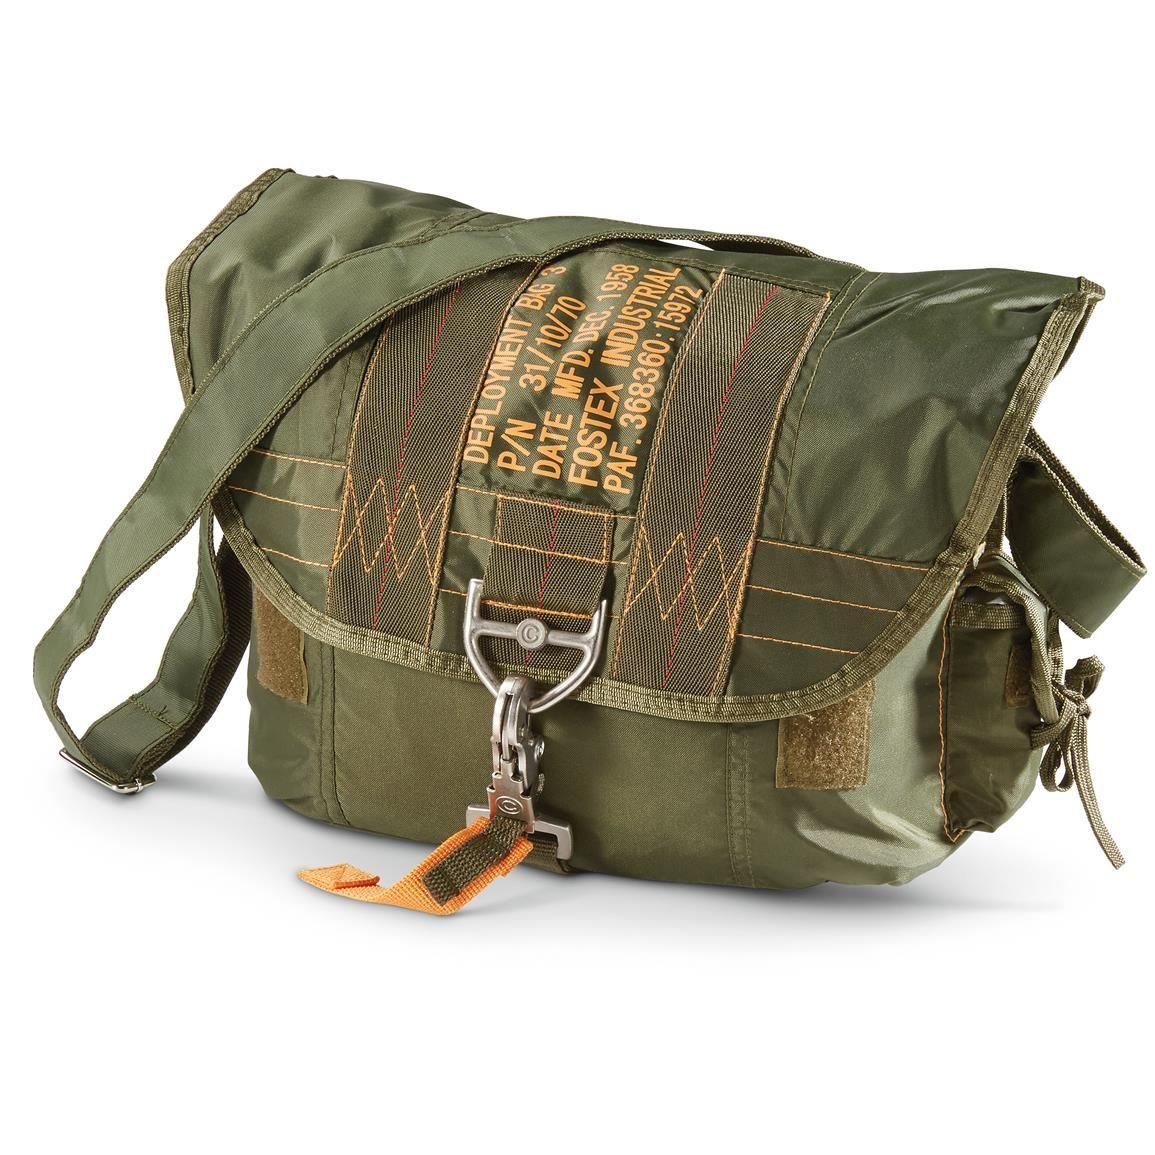 1c08d46b8 Army Surplus Store | Military Surplus Backpacks & Duffle Bags ...